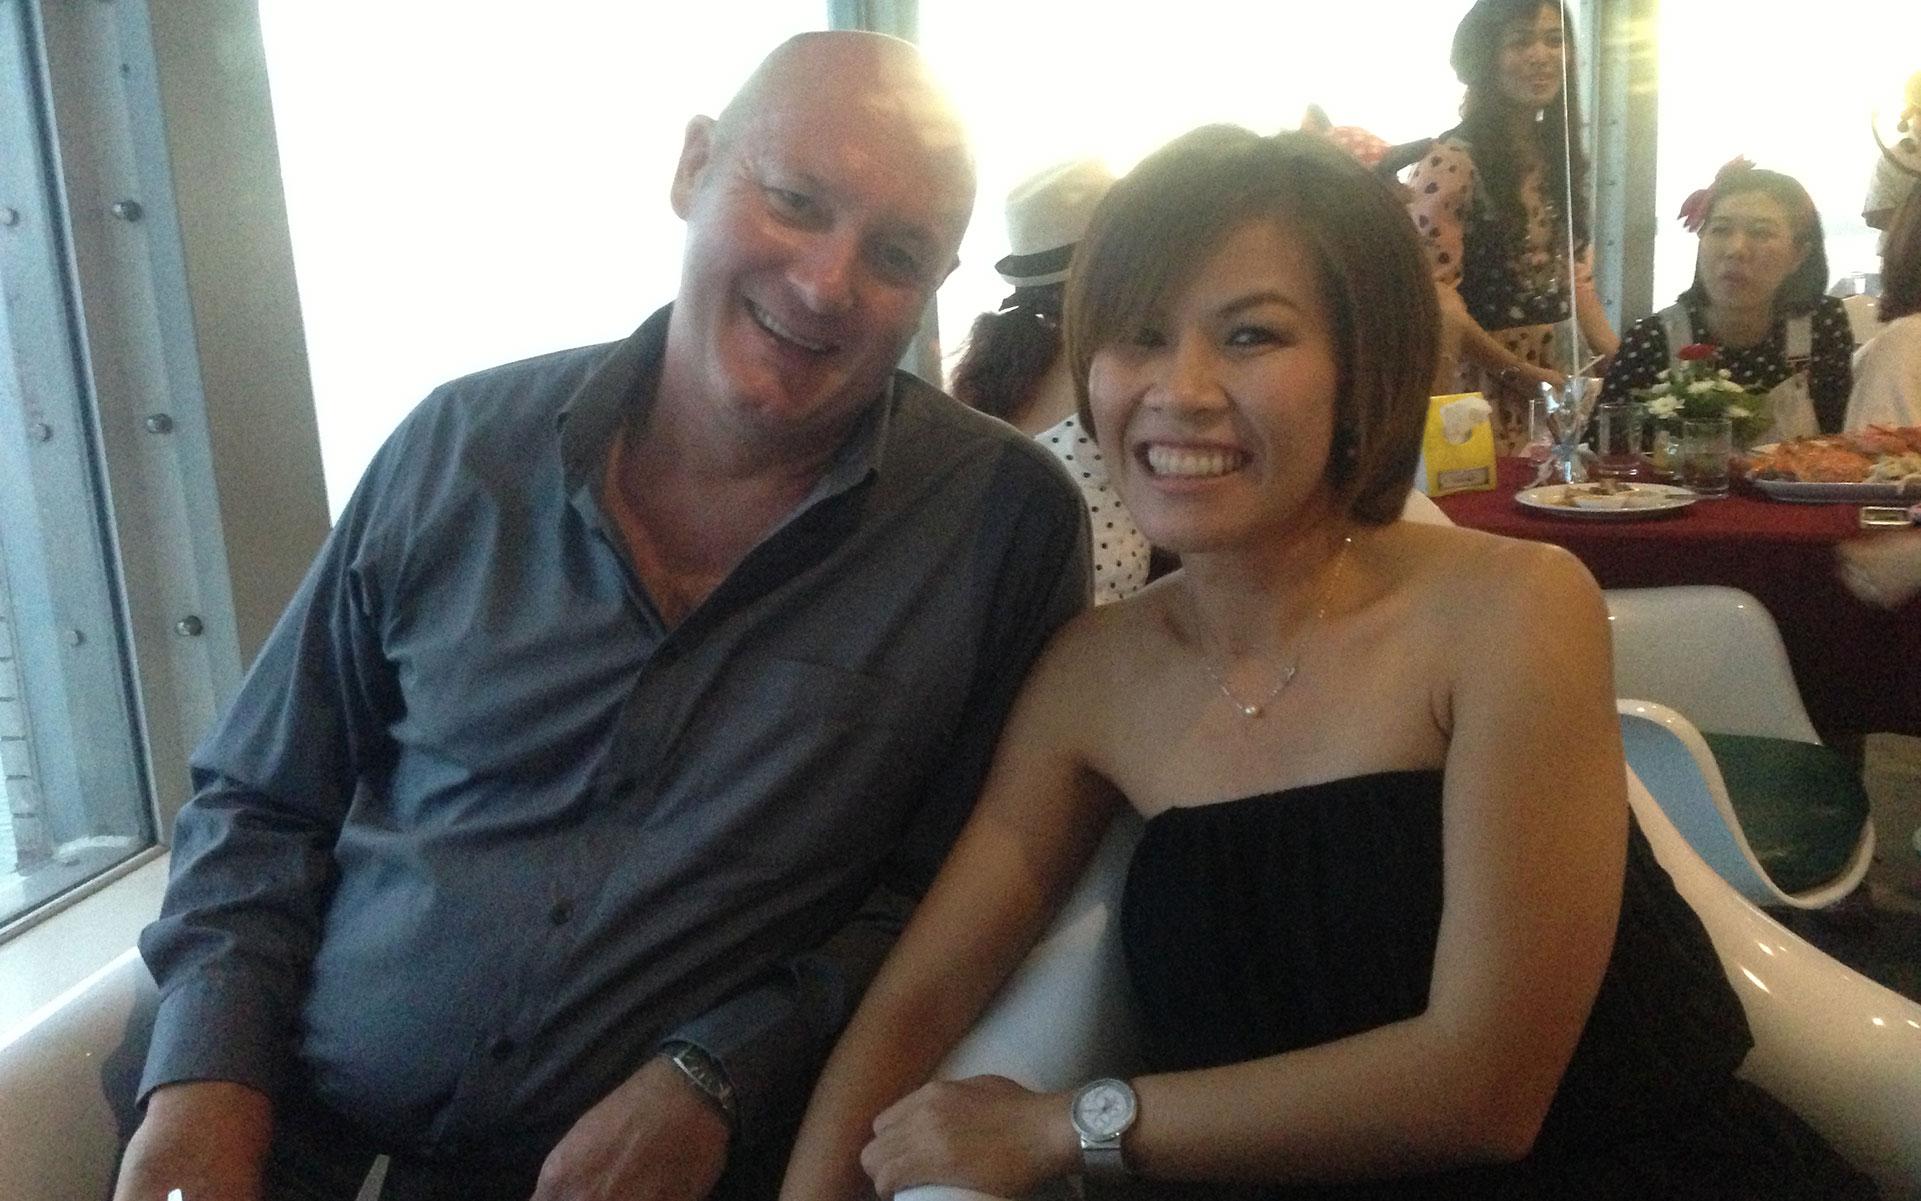 Dutch cannabis pioneer returns home after 5 years in Thai prison thumbnail